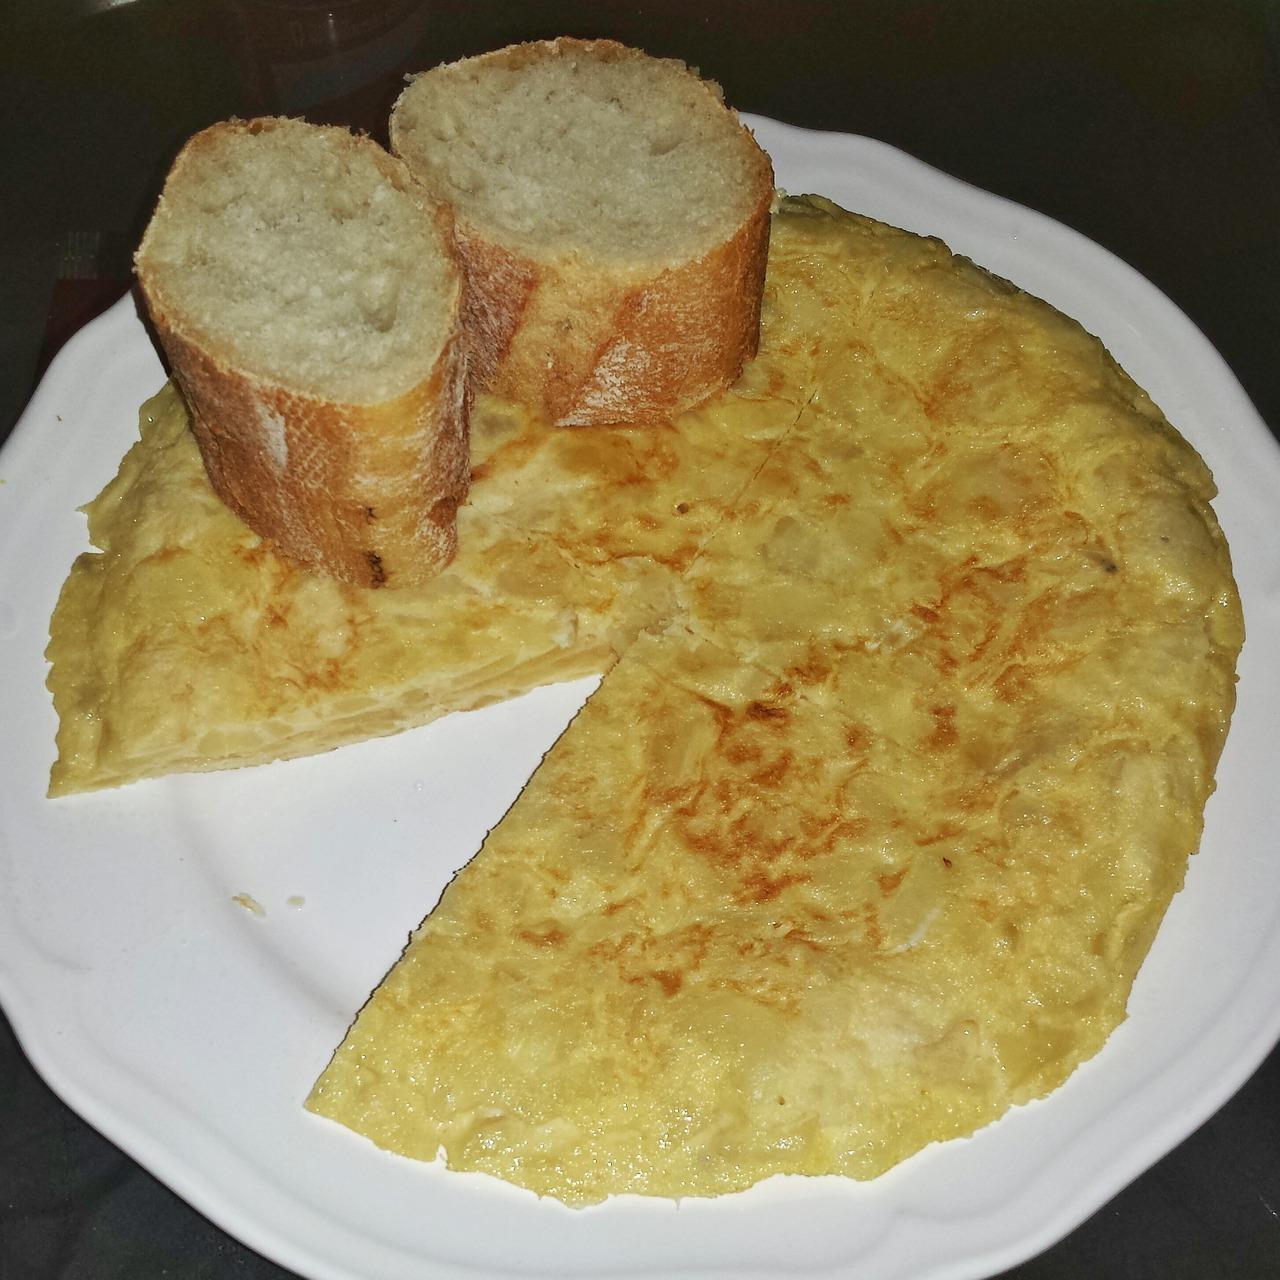 Tortilla 988986 1280